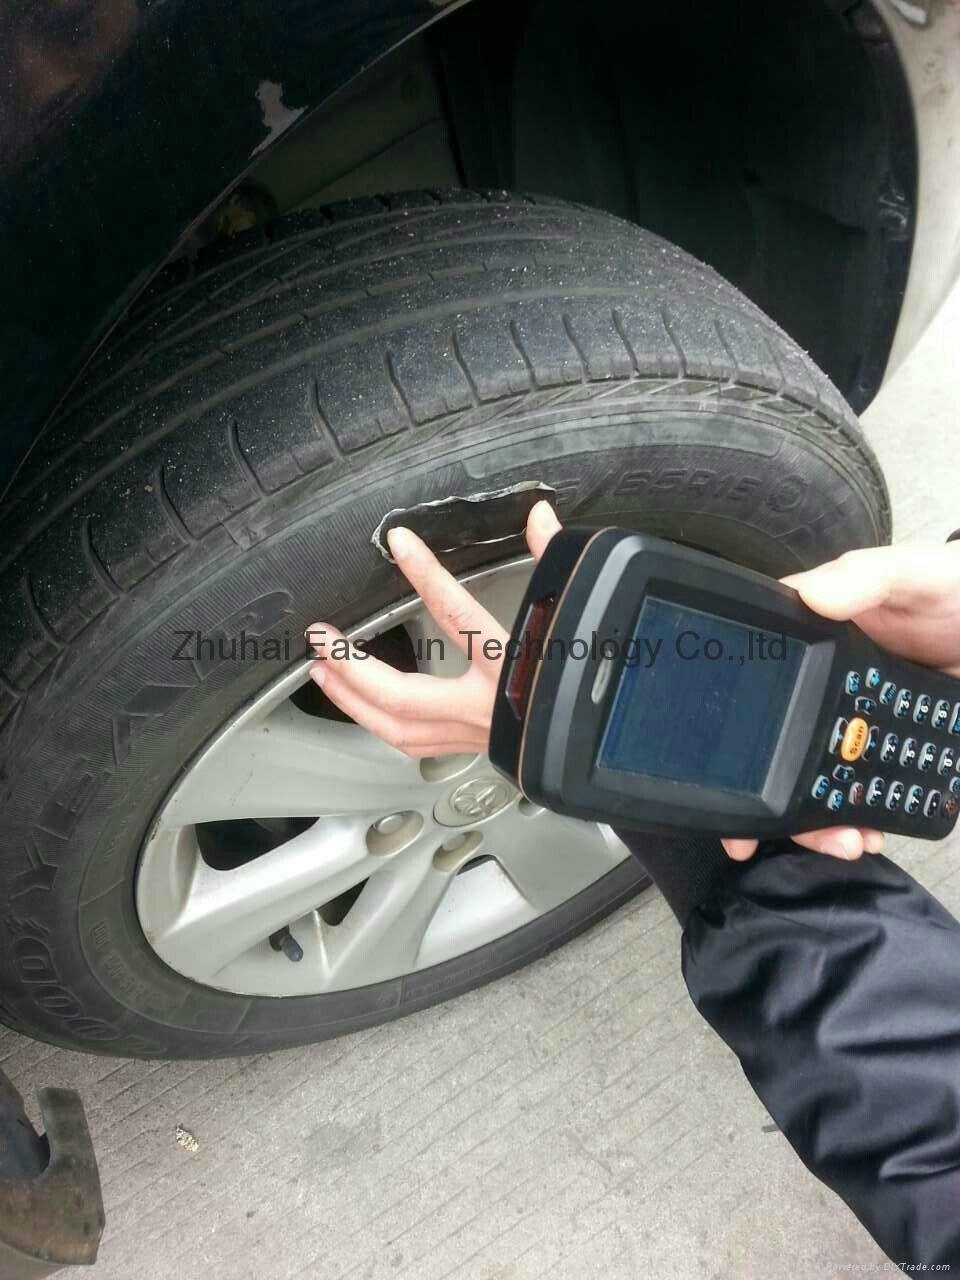 RFID 超高頻 車輛管理 輪胎管理 輪胎標籤 5